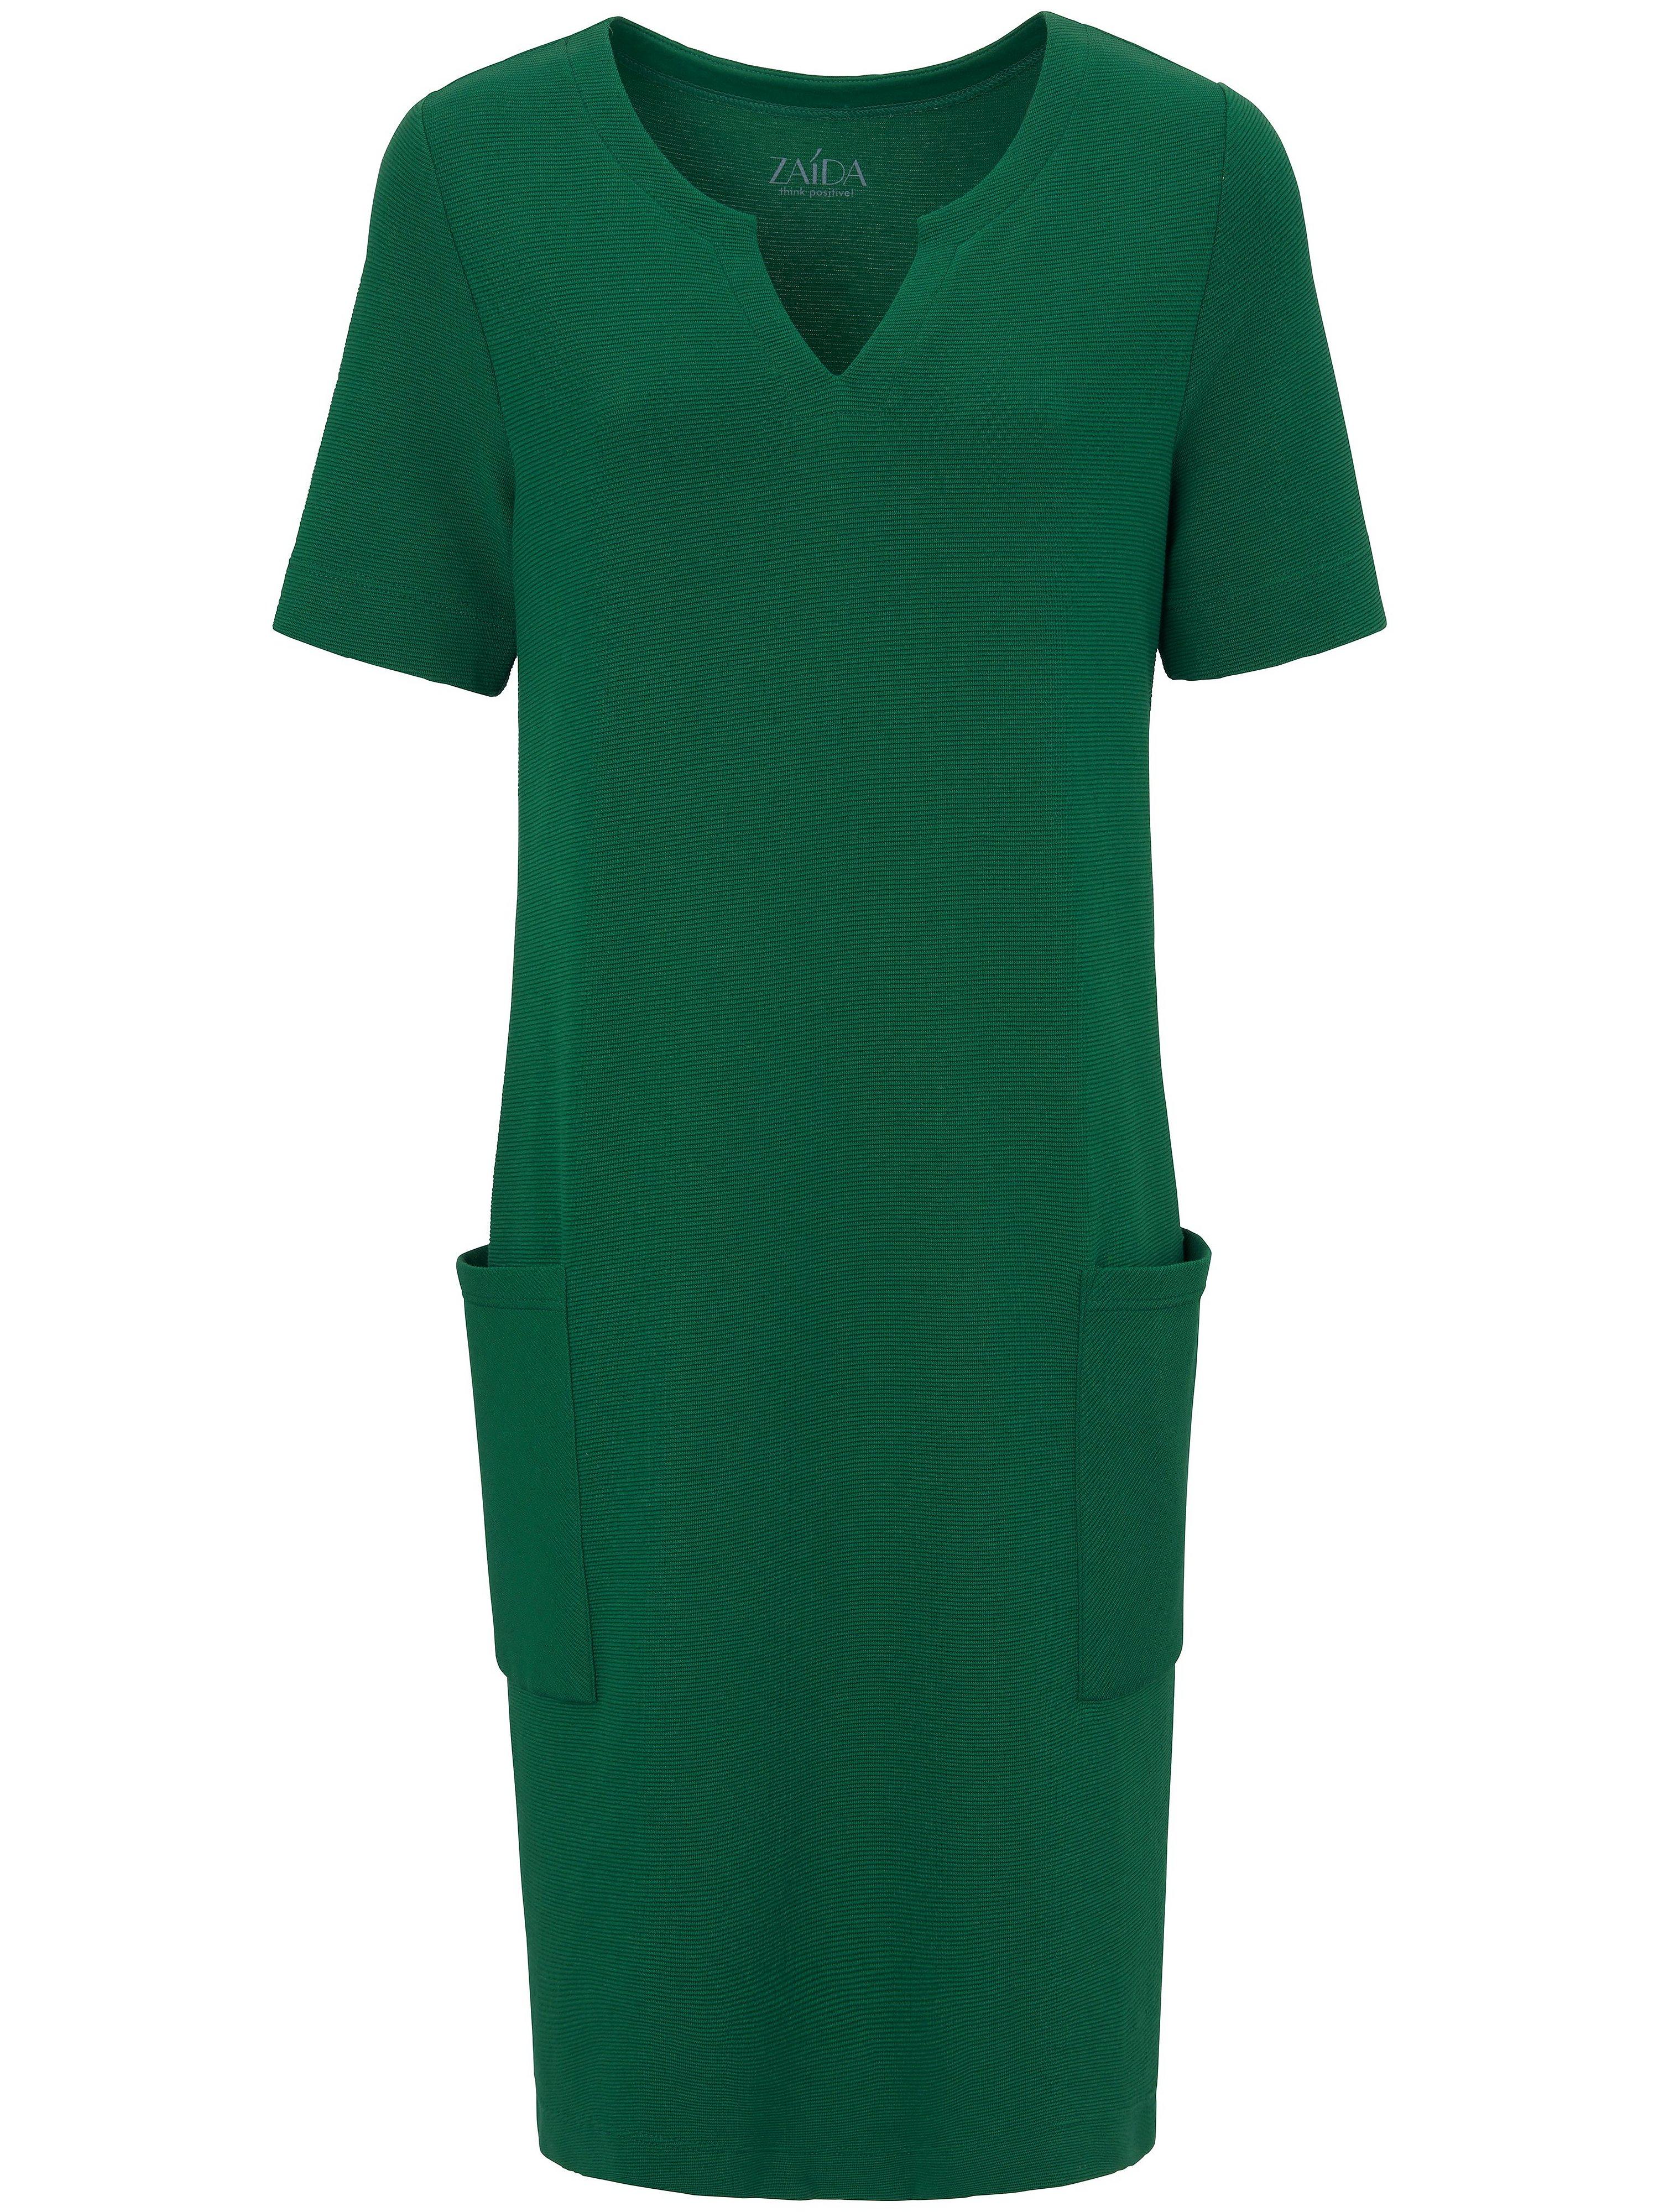 La robe manches courtes  ZAIDA vert taille 48